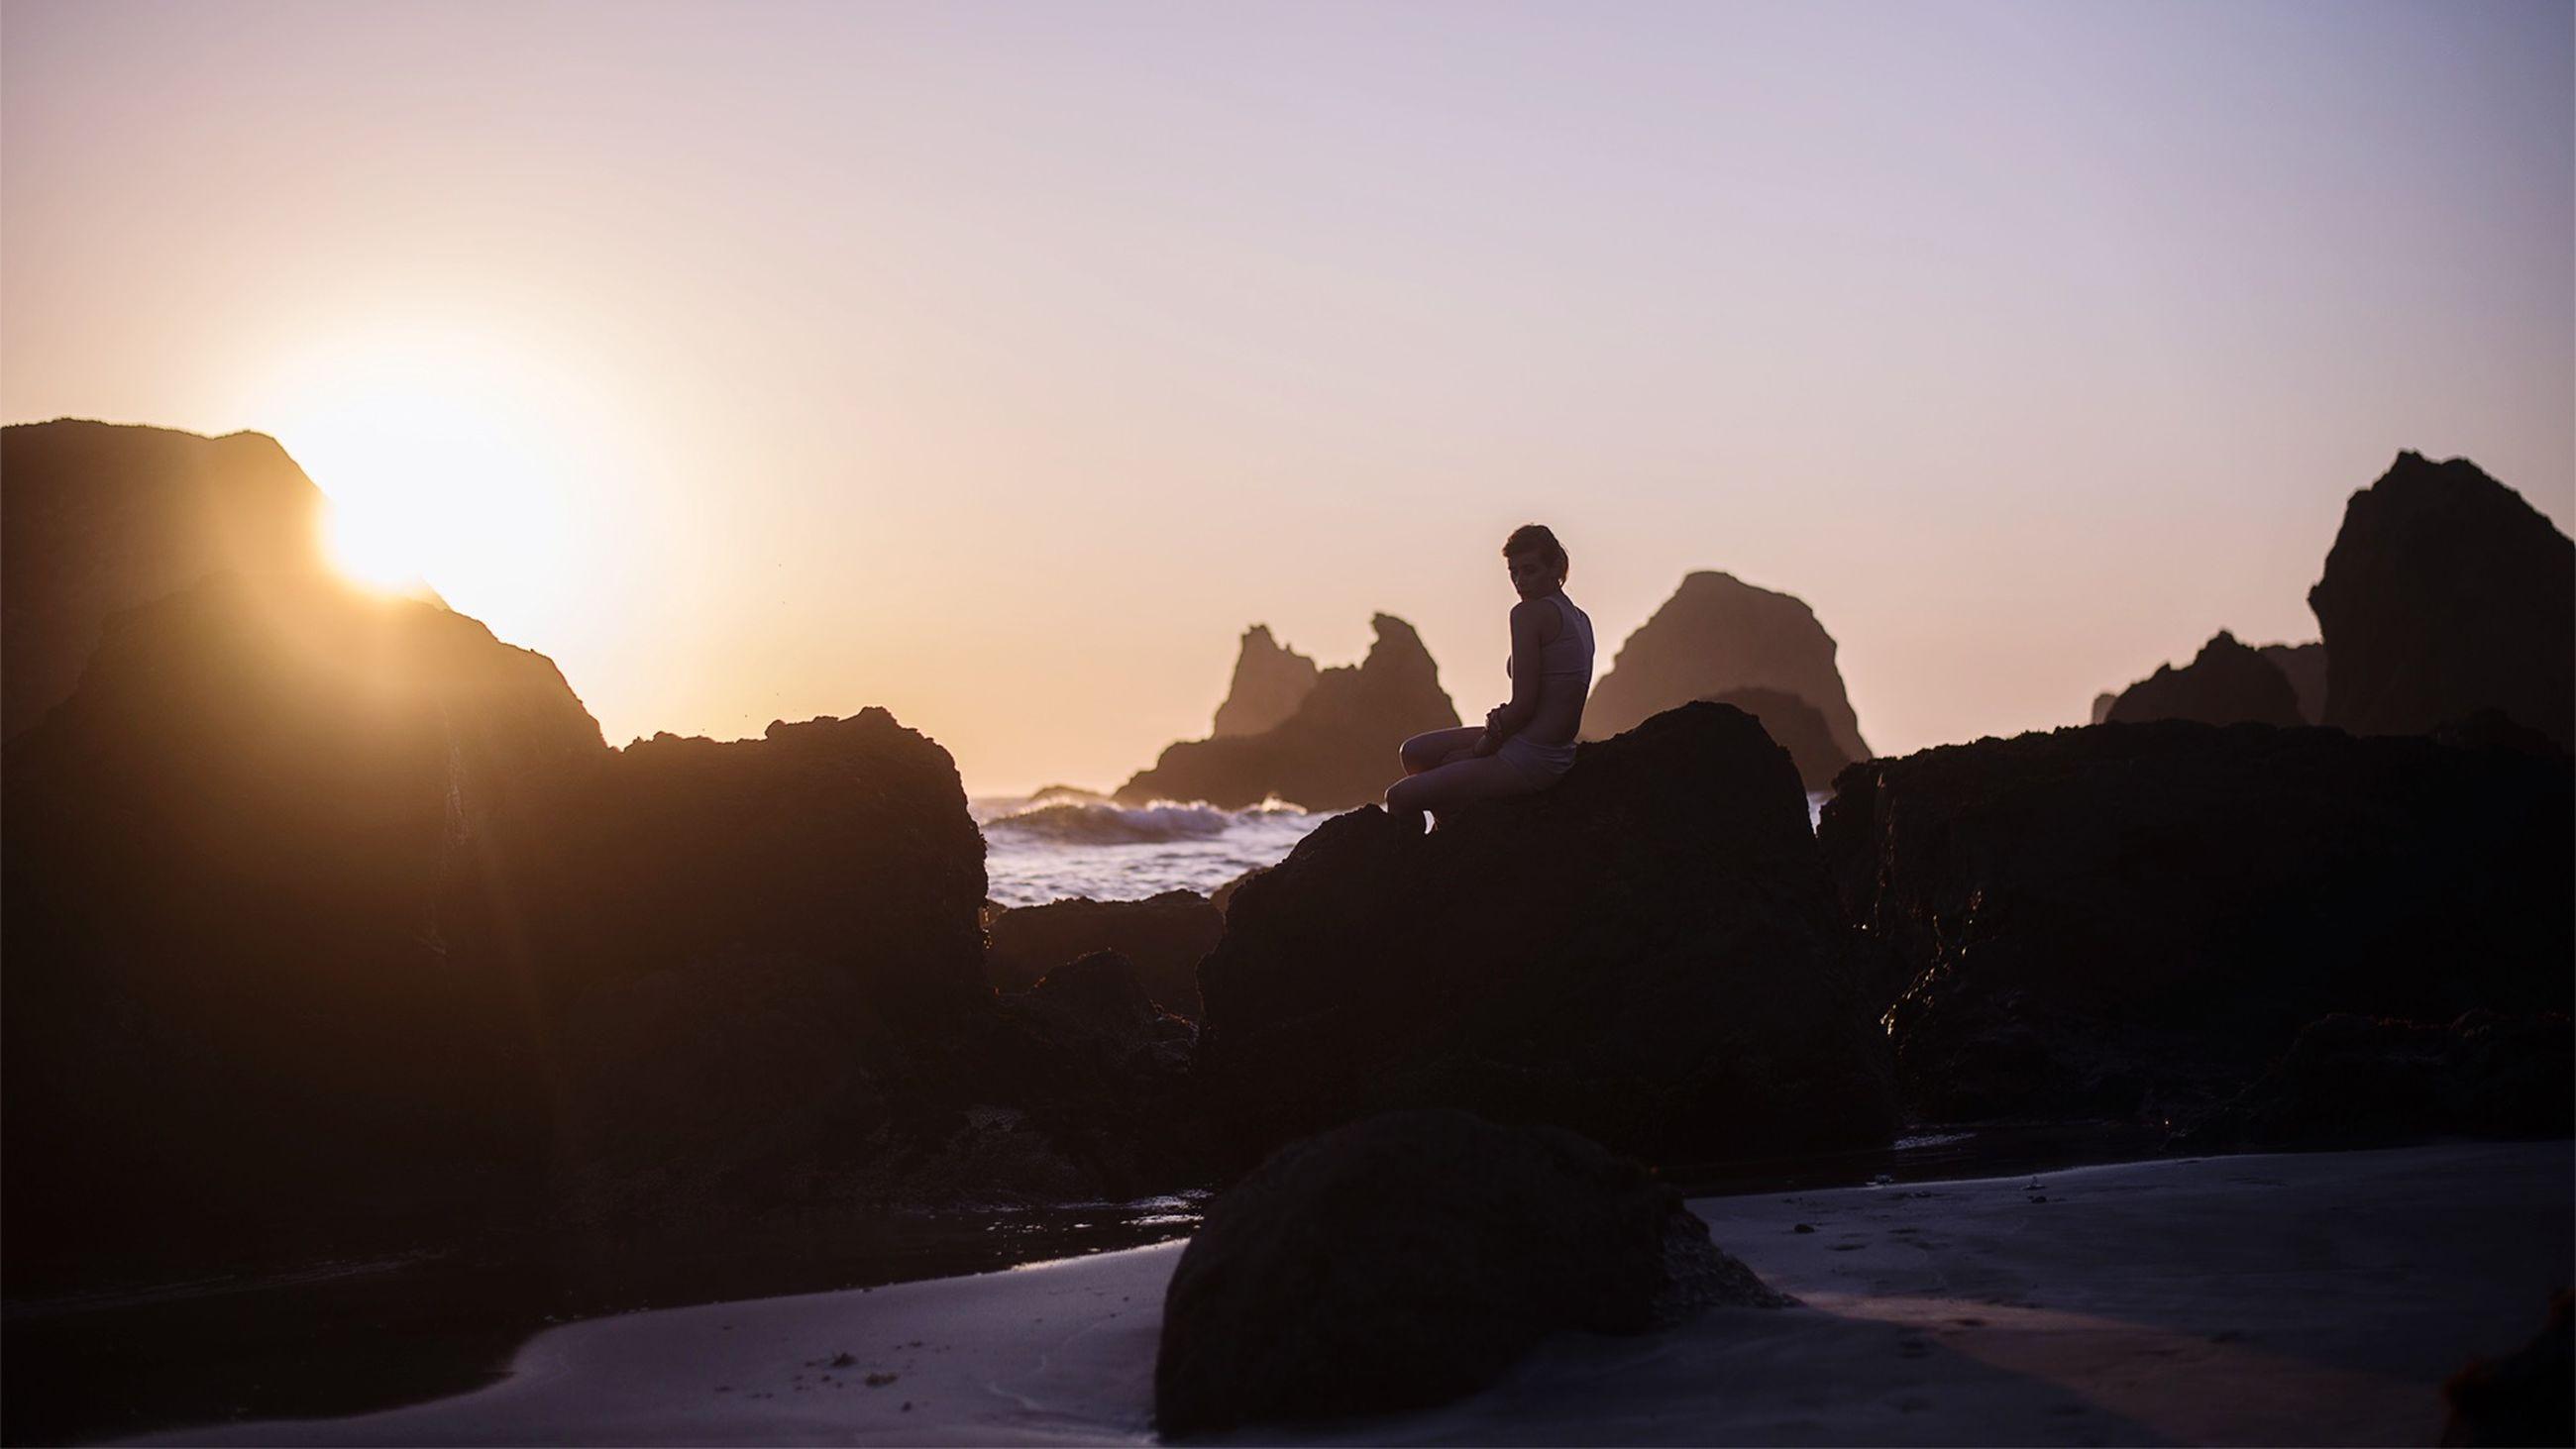 sun, sunset, lifestyles, clear sky, leisure activity, sunlight, men, silhouette, sunbeam, rock - object, sea, lens flare, copy space, beach, scenics, water, vacations, sky